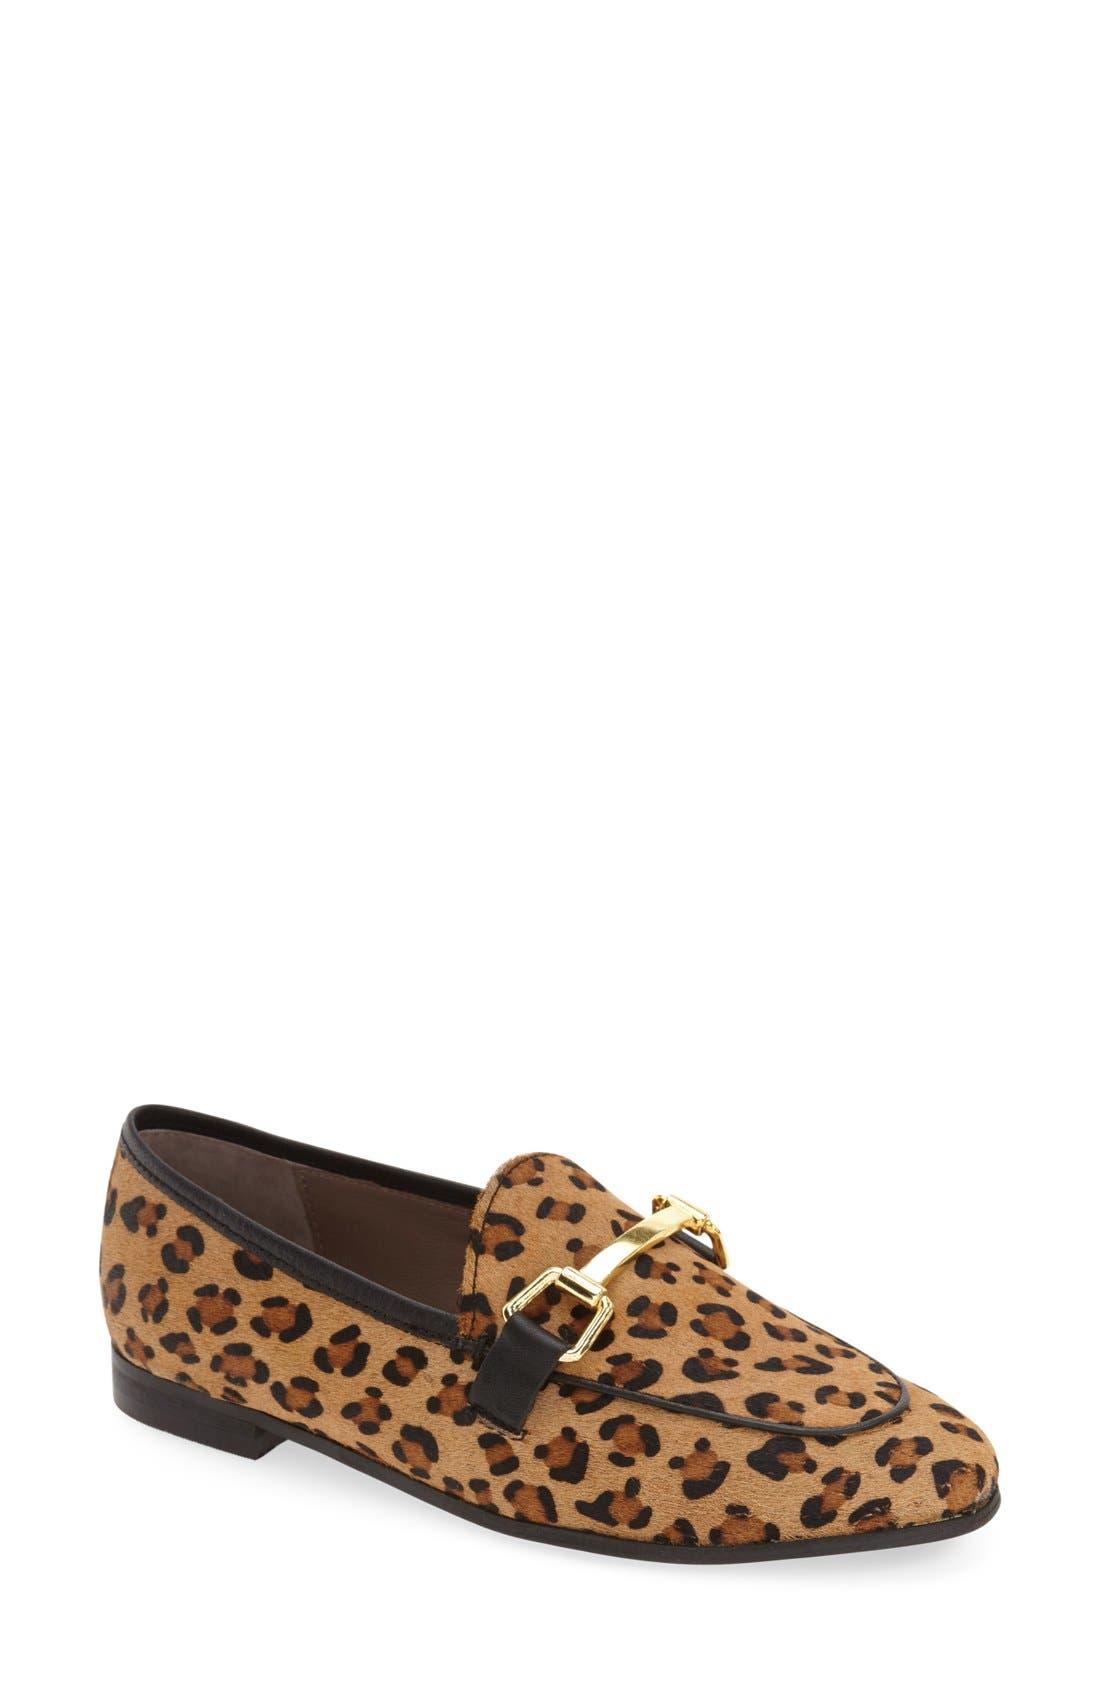 Alternate Image 1 Selected - Topshop 'Kendall' Genuine Calf Hair Loafer (Women)